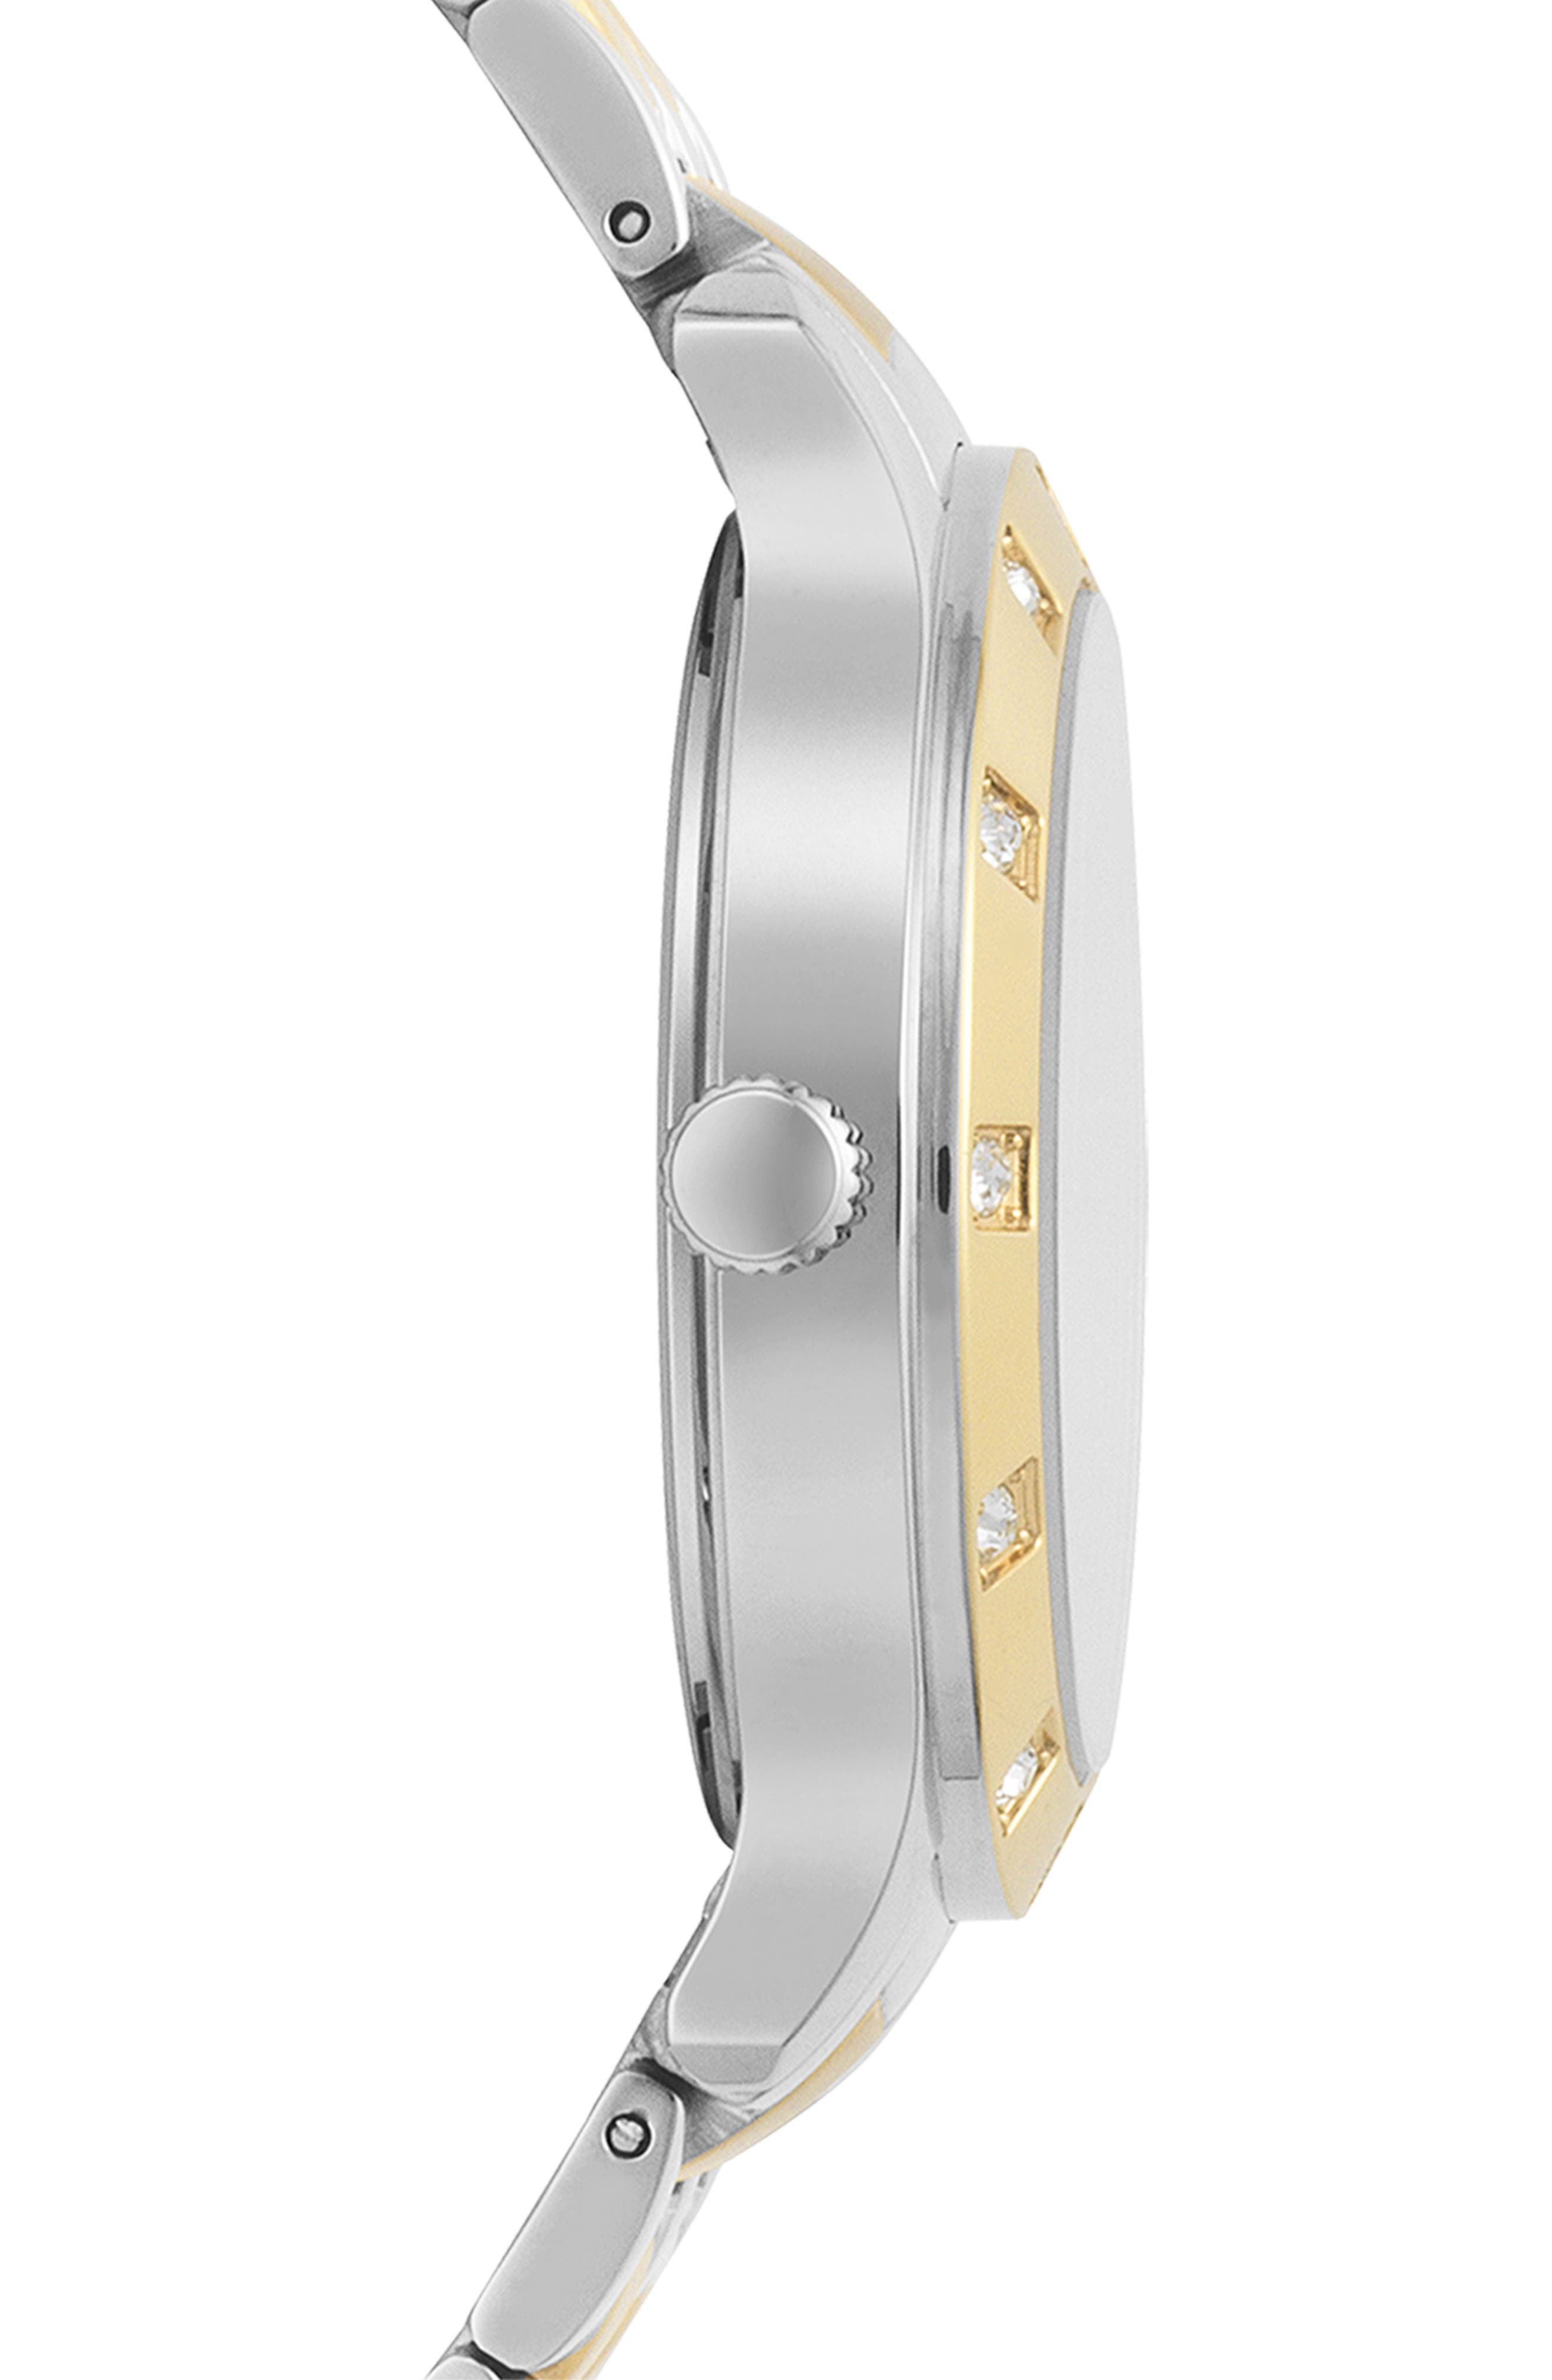 VERSUS VERSACE, Brackenfell Swarovski Bracelet Watch, 38mm, Alternate thumbnail 2, color, GOLD/ SILVER